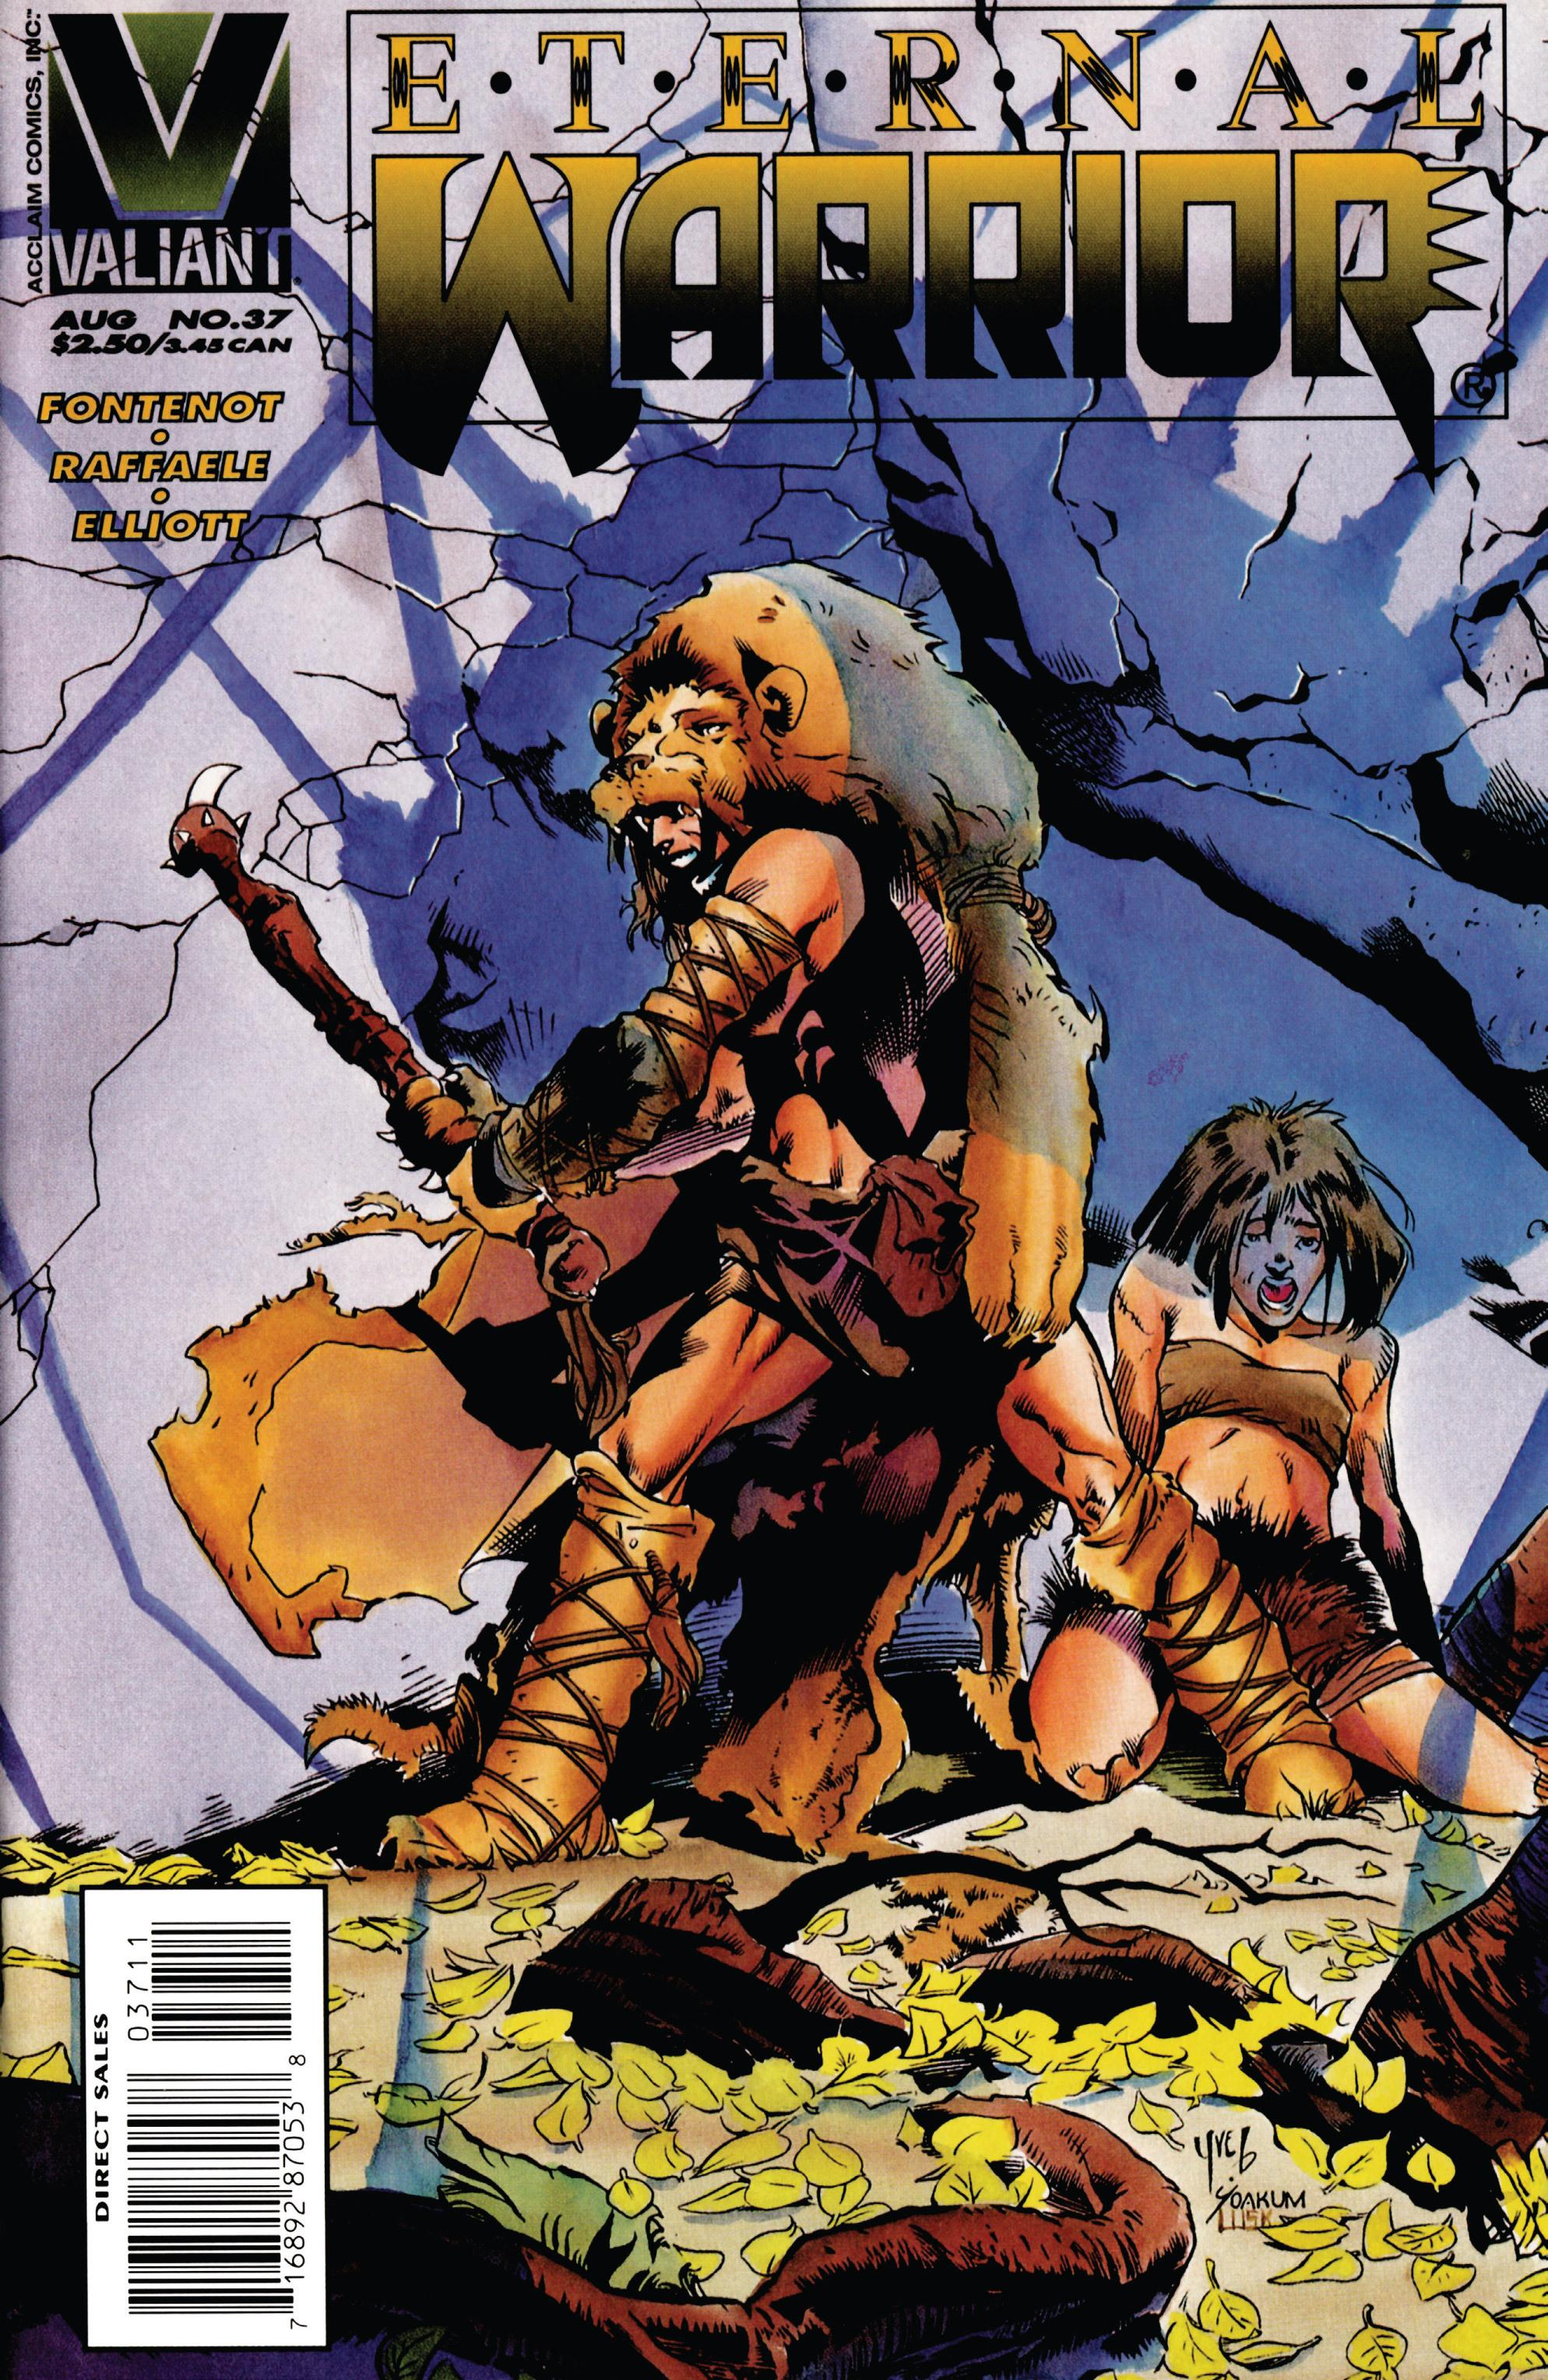 Read online Eternal Warrior (1992) comic -  Issue #37 - 1